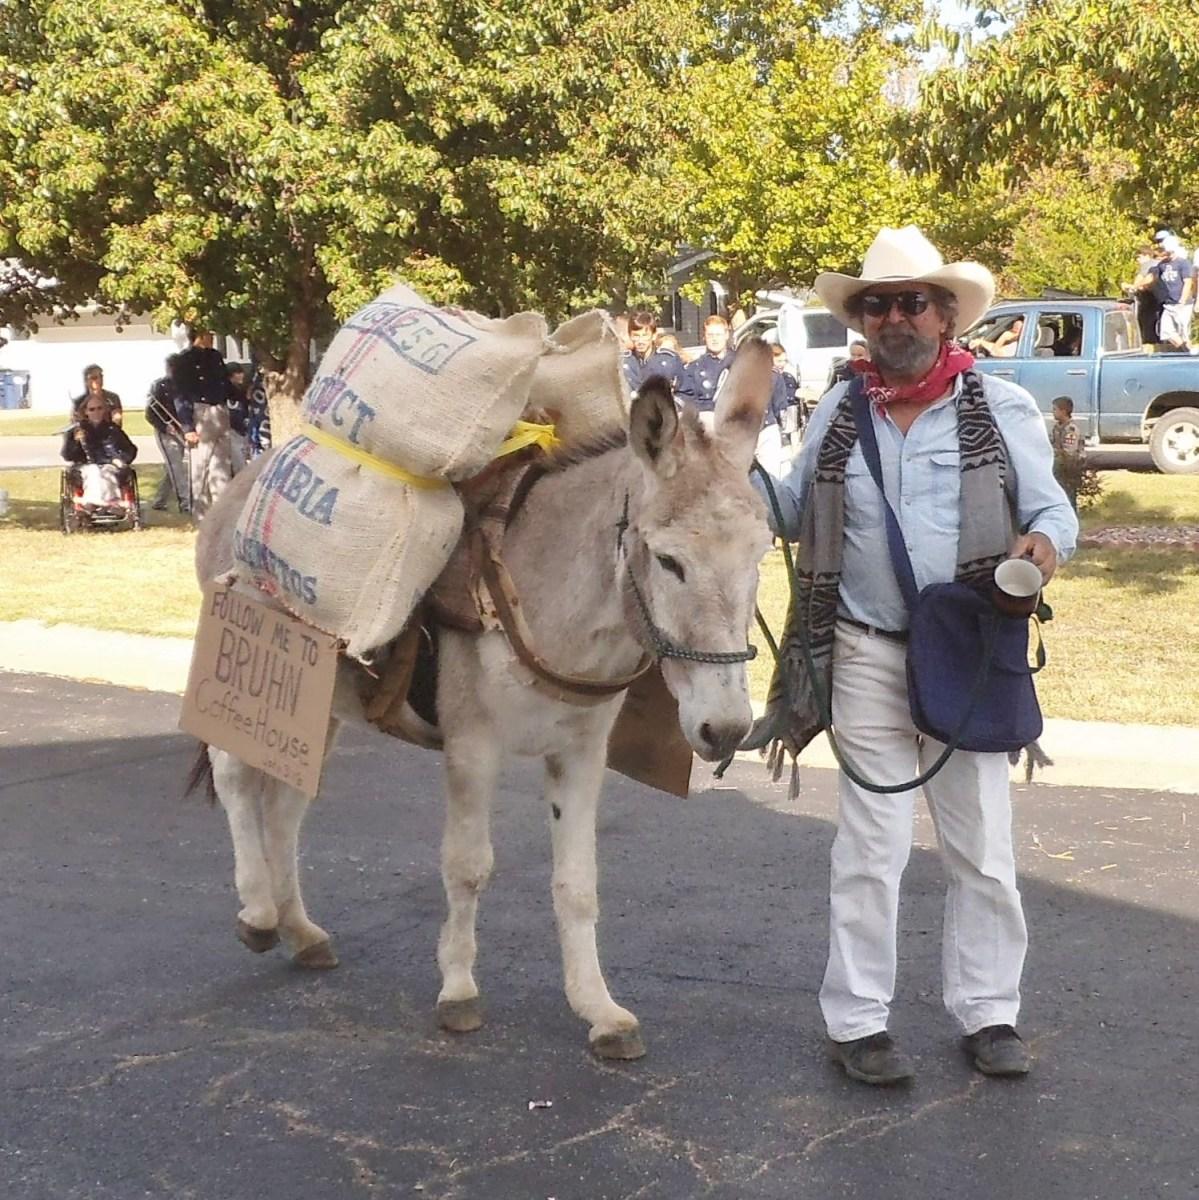 Juan Valdez with his burro and sacks of coffee